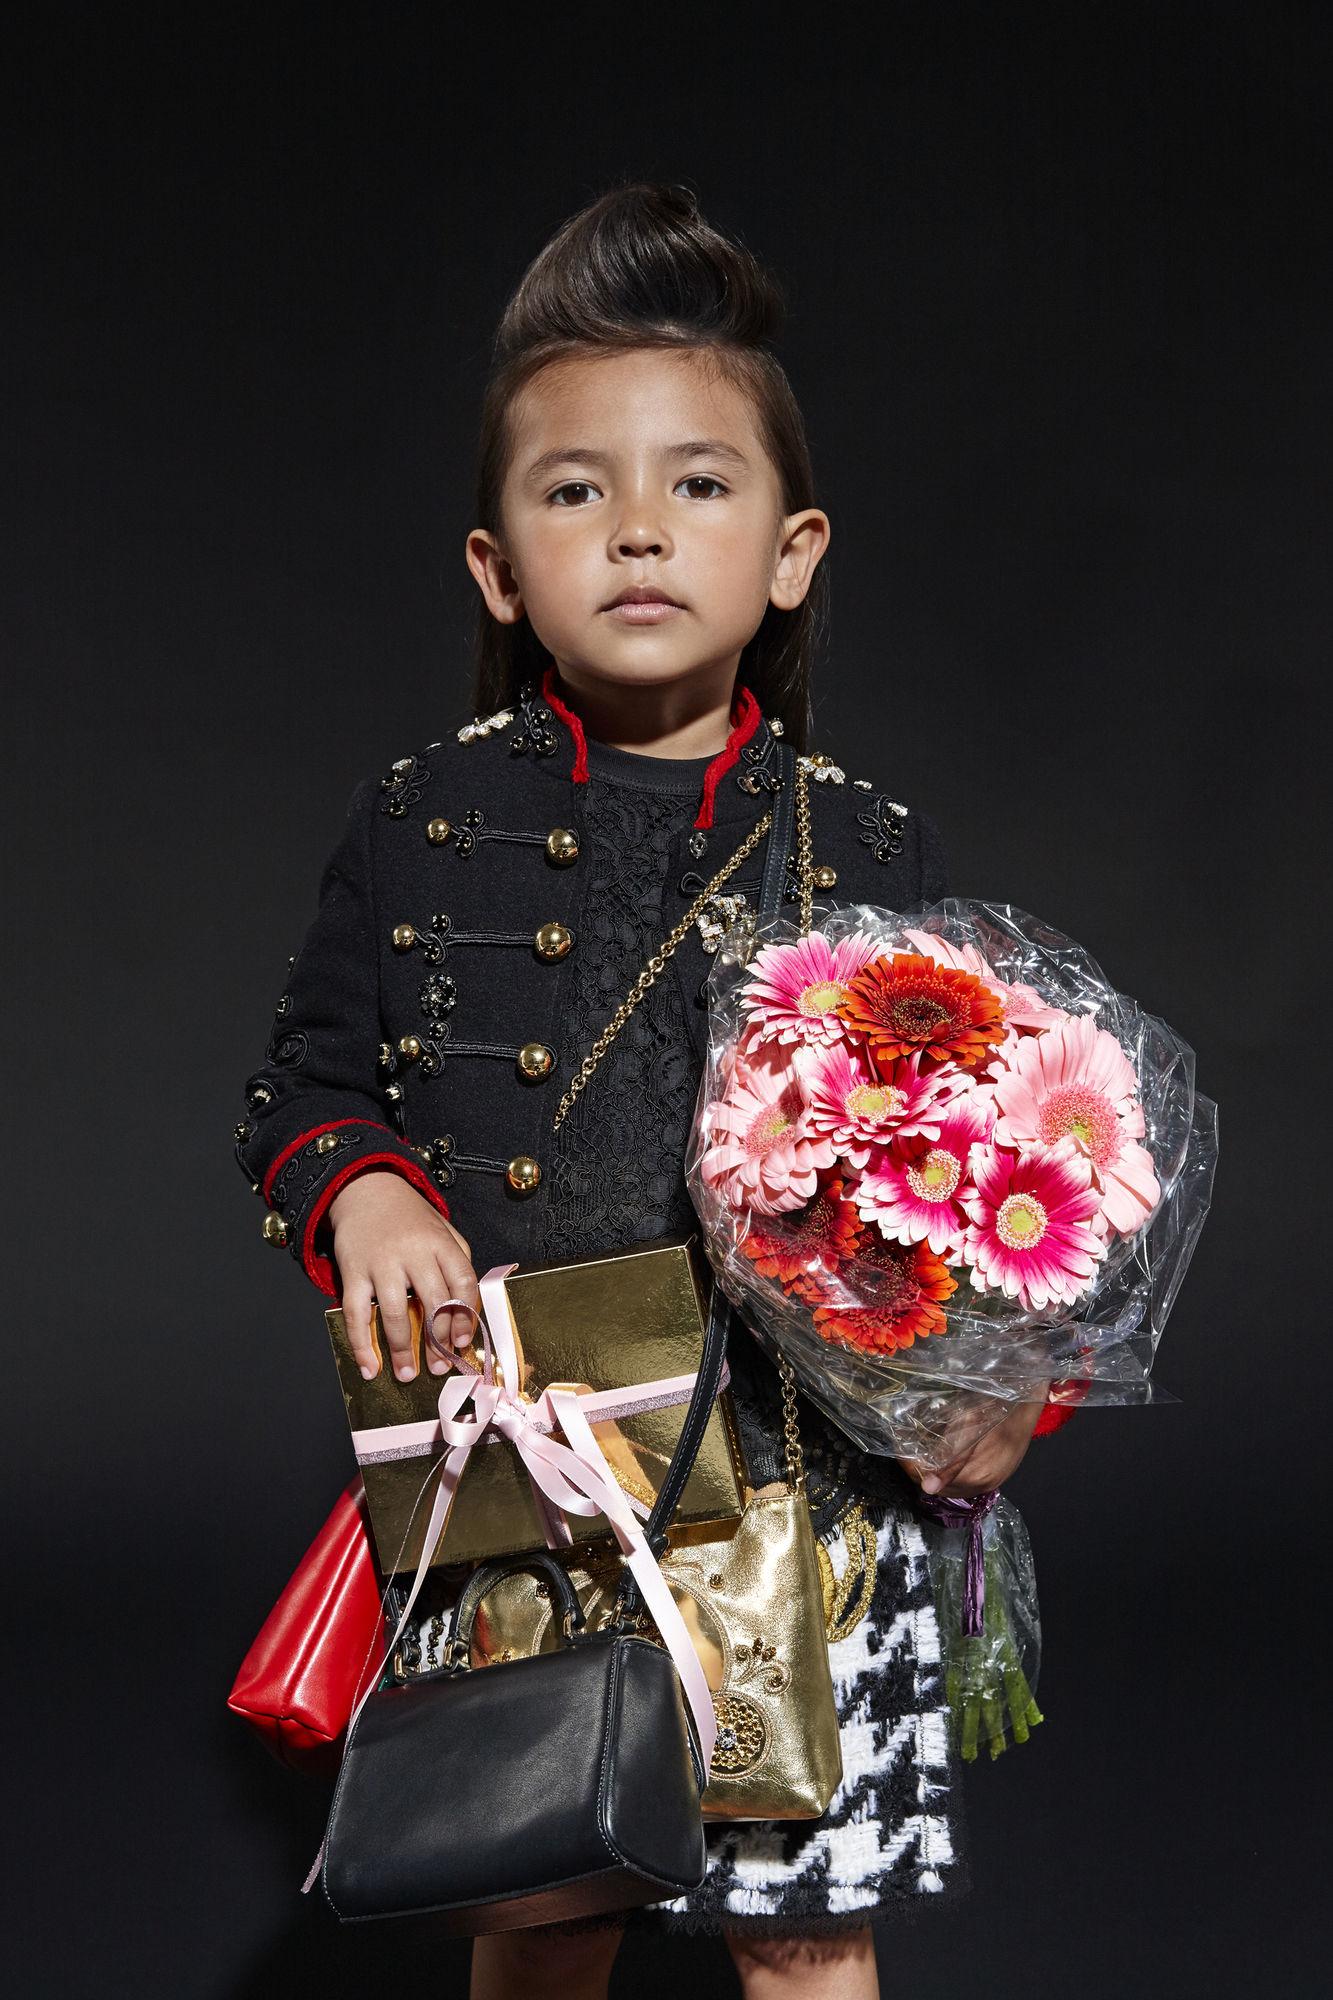 Dolce & Gabbana Special by Achim Lippoth